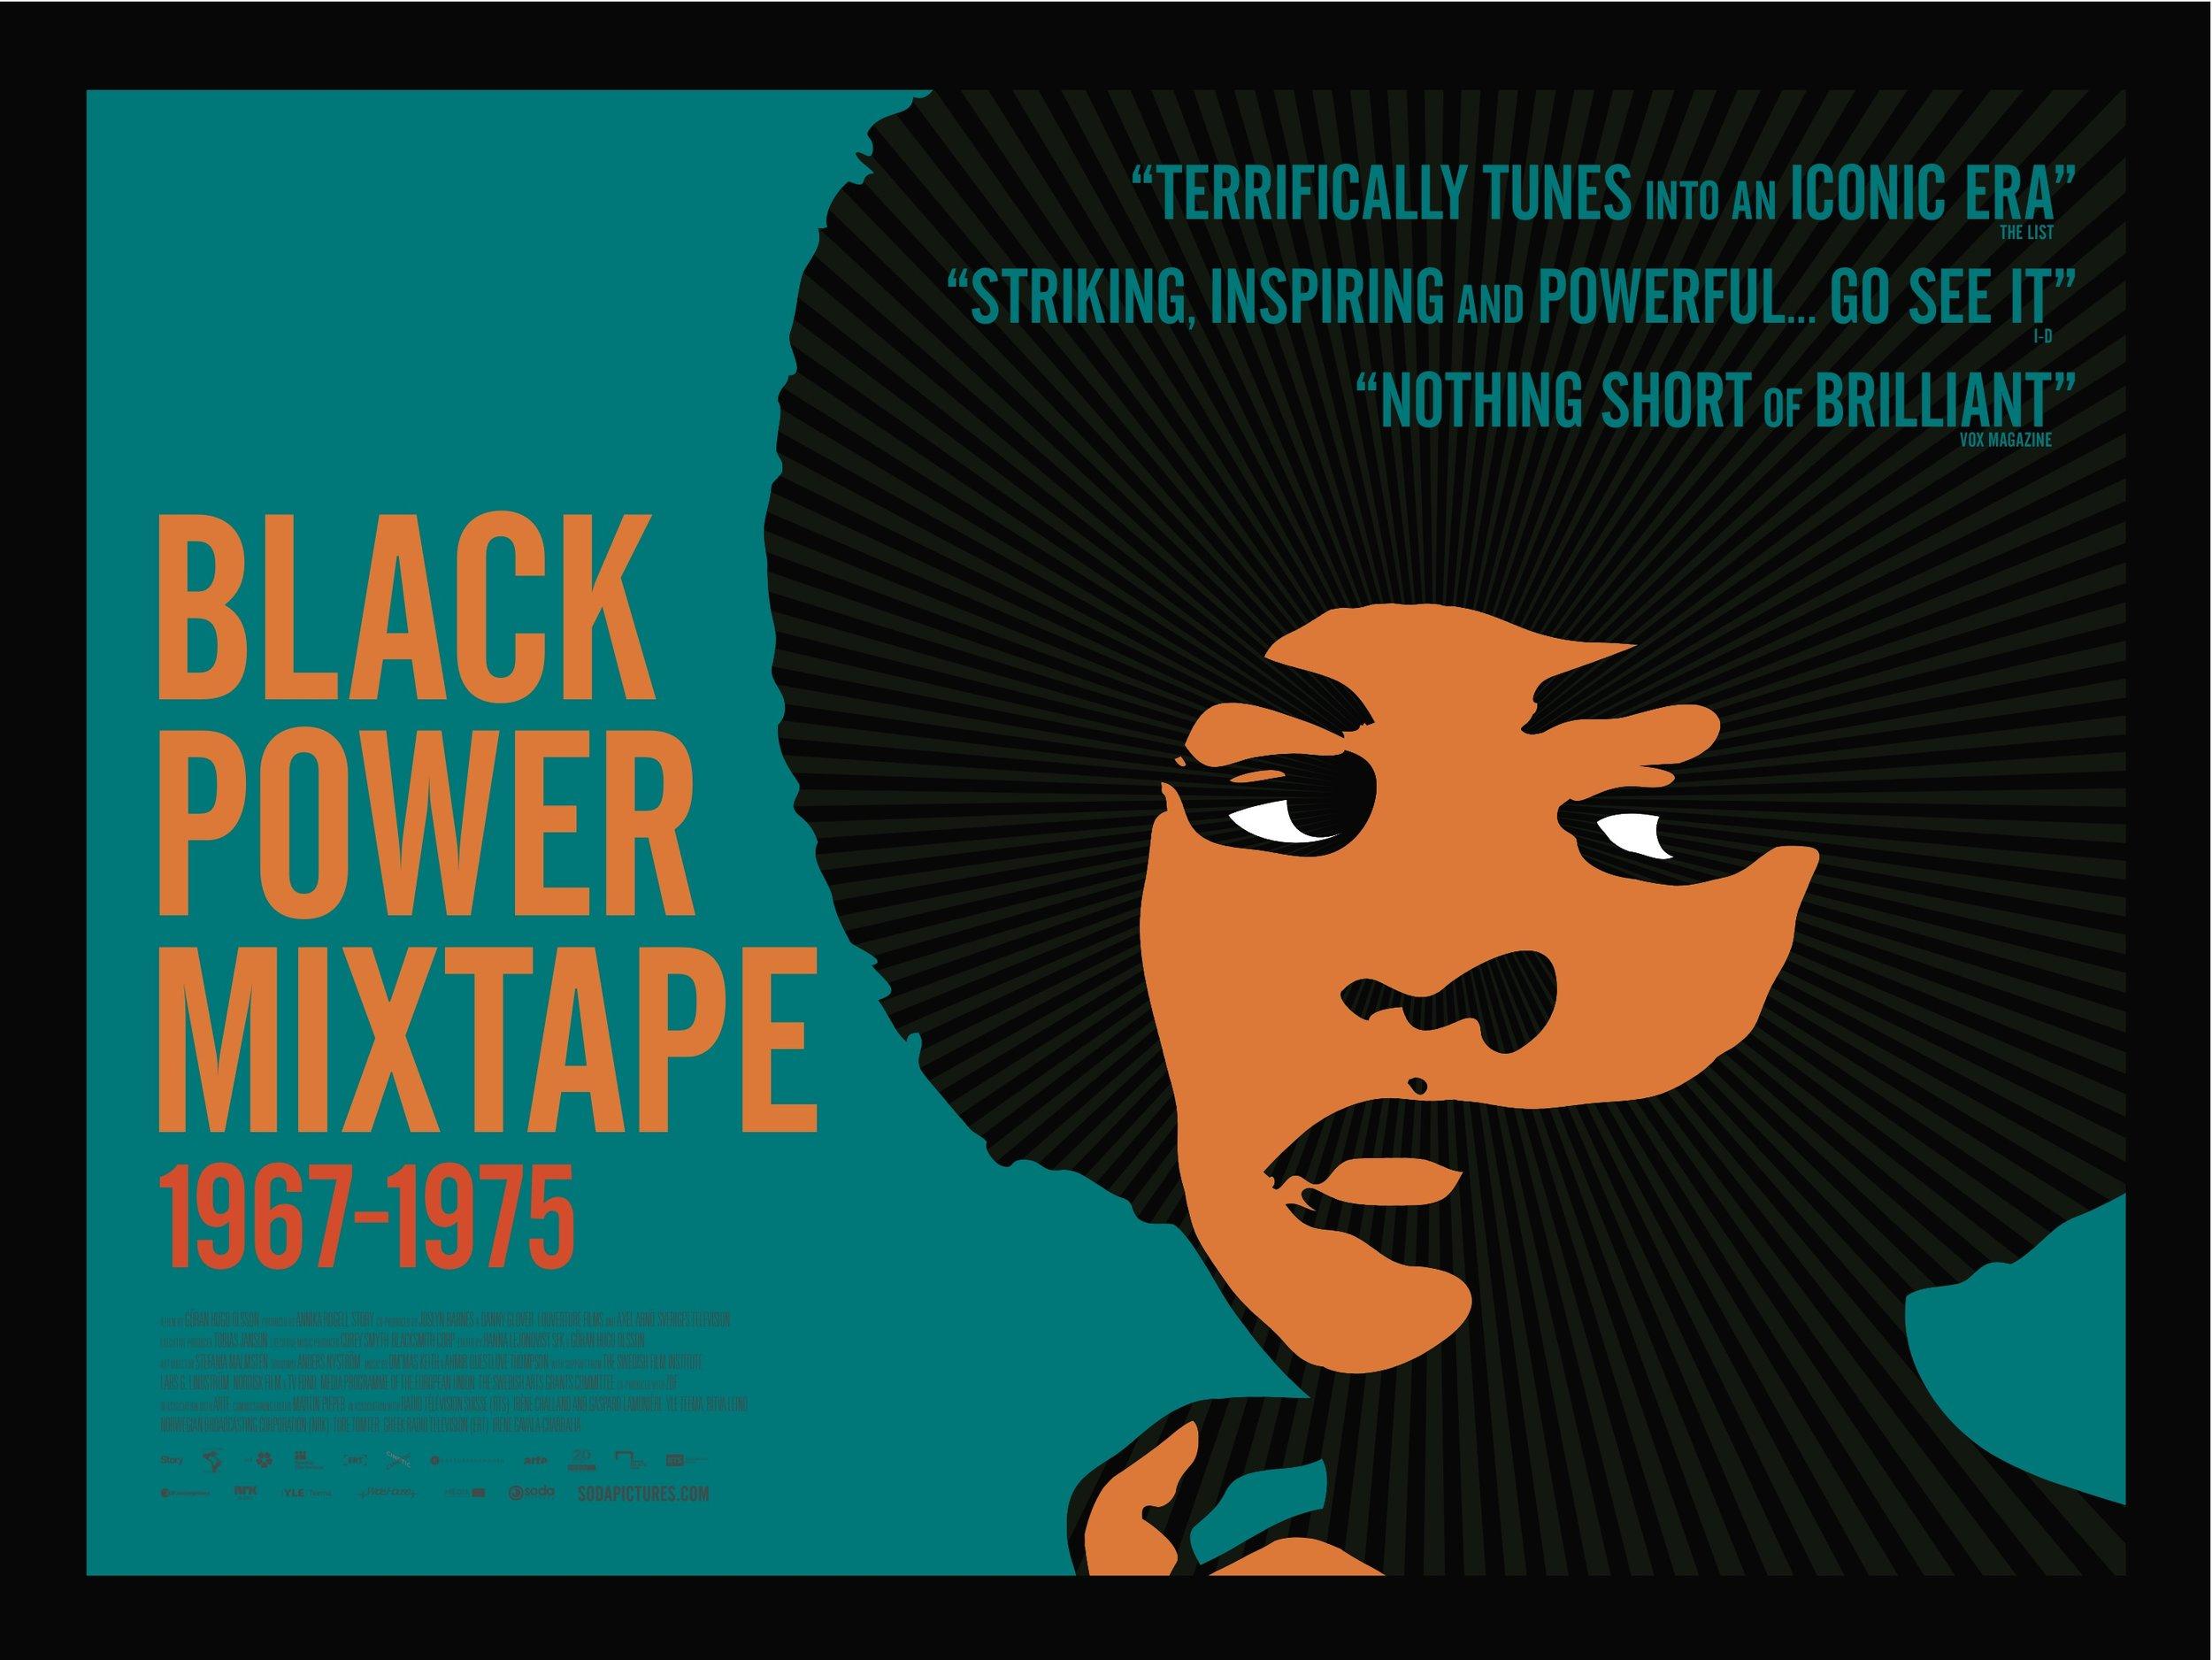 The Black Power Mixtape 1967-1975 (Dir. Goran Olsson, 2011)